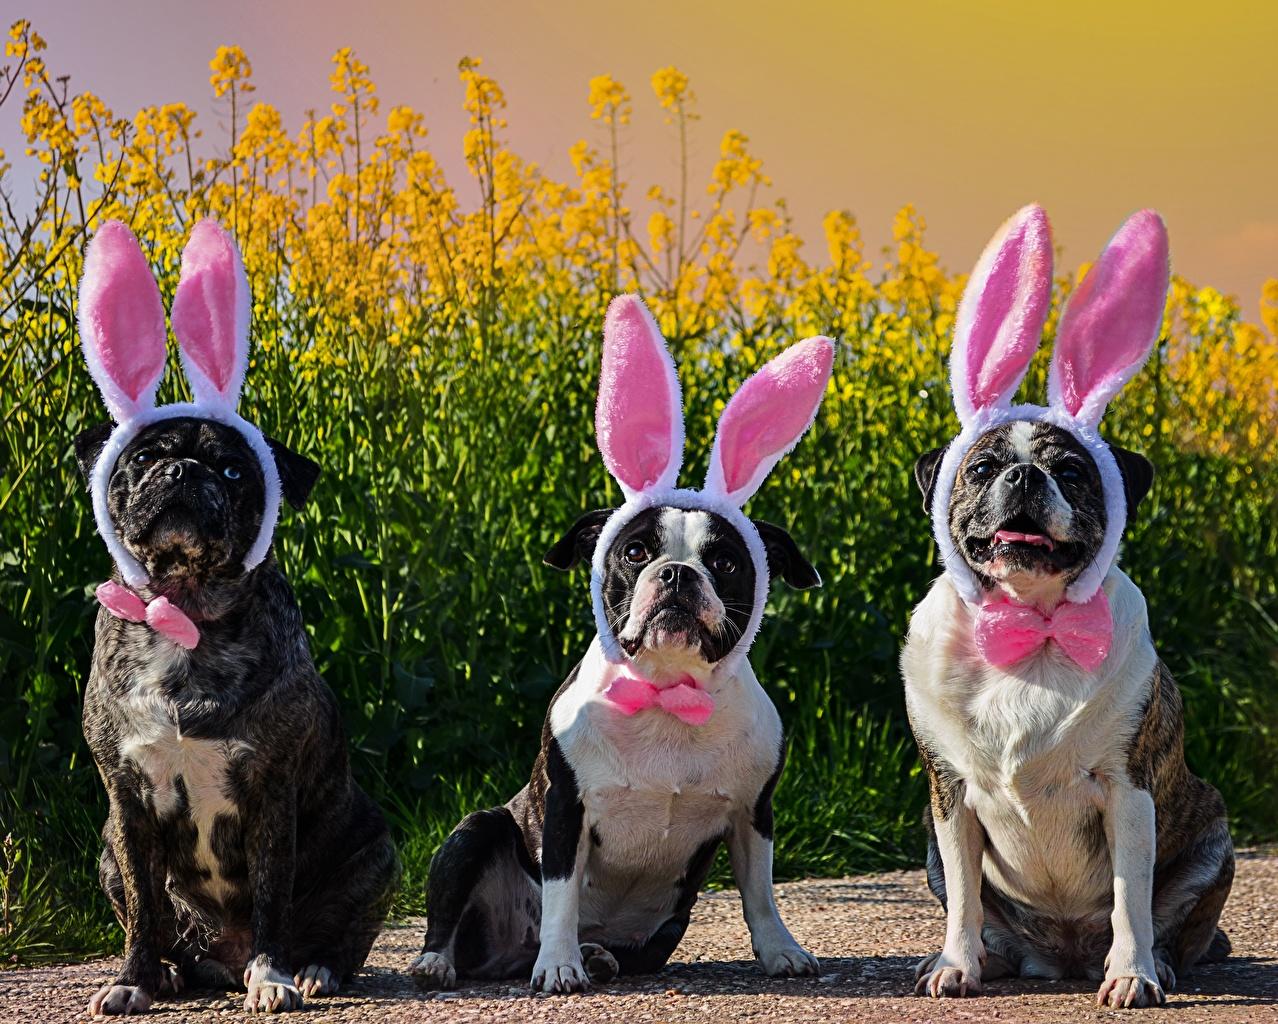 Photo funny Bulldog Dogs Rabbit ears Three 3 Bow tie Humor dog